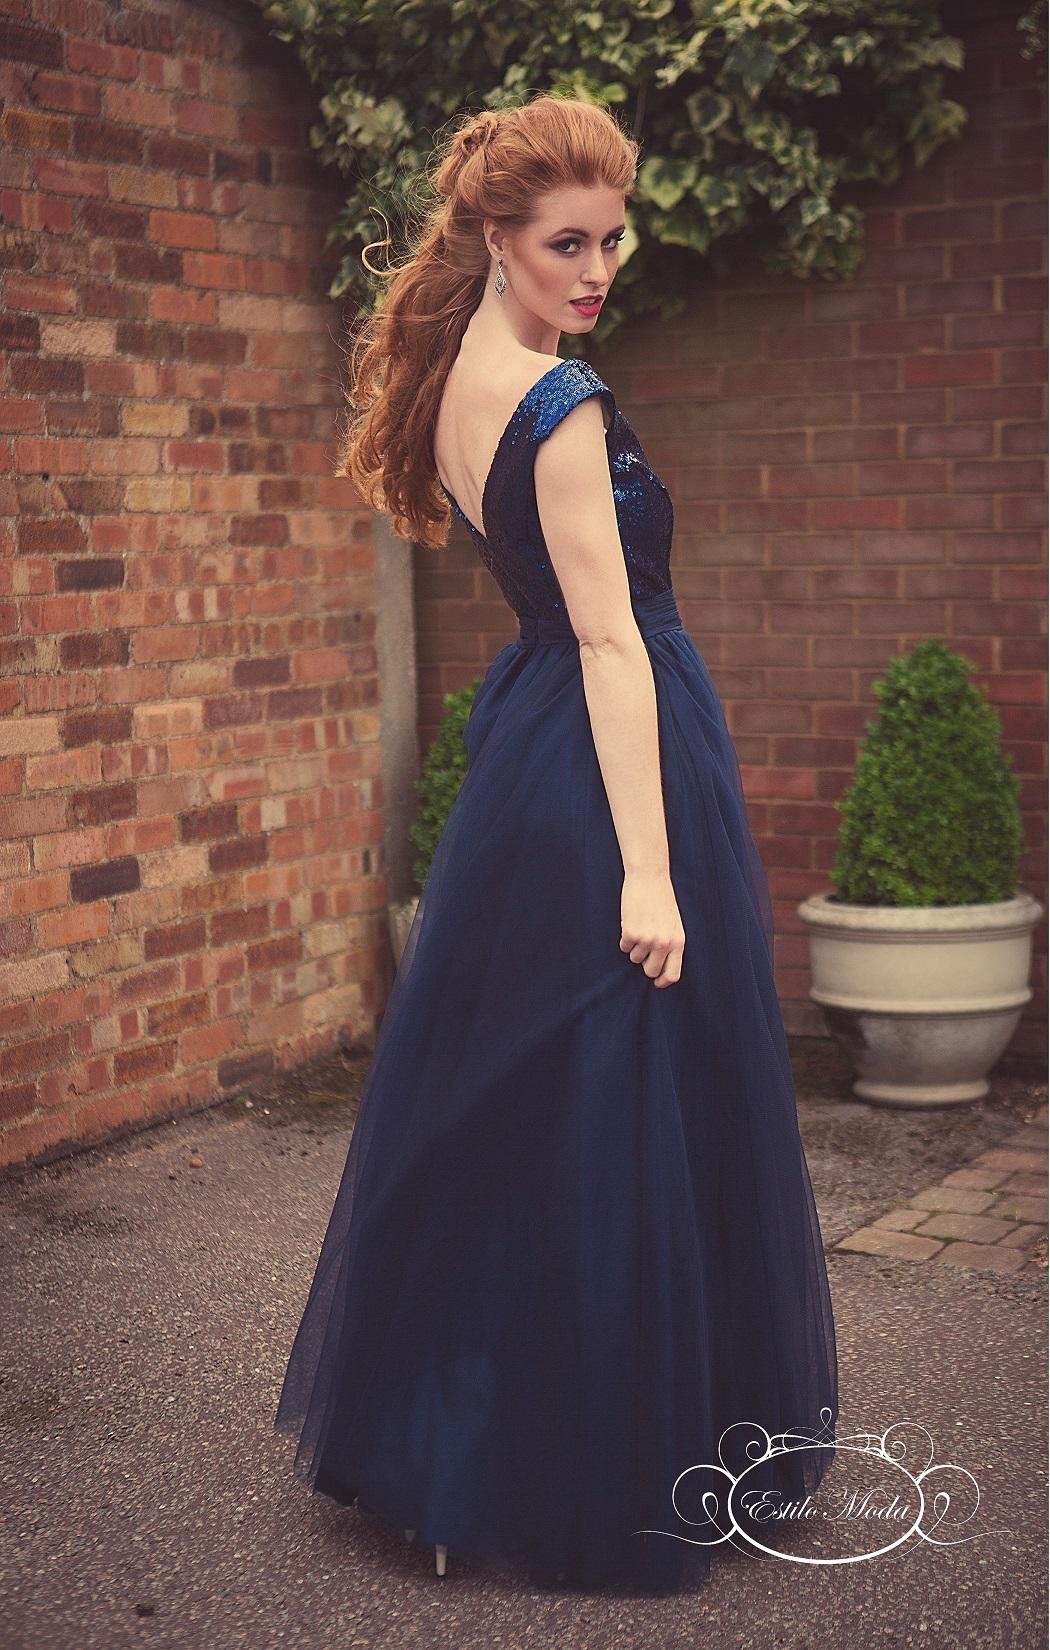 Estilo Moda Sequin V Neck bodice and multi-layered tulle ball gown skirt prom dresses in milton keynes. navy blue evening dress, blue sequin bridesmaid dress